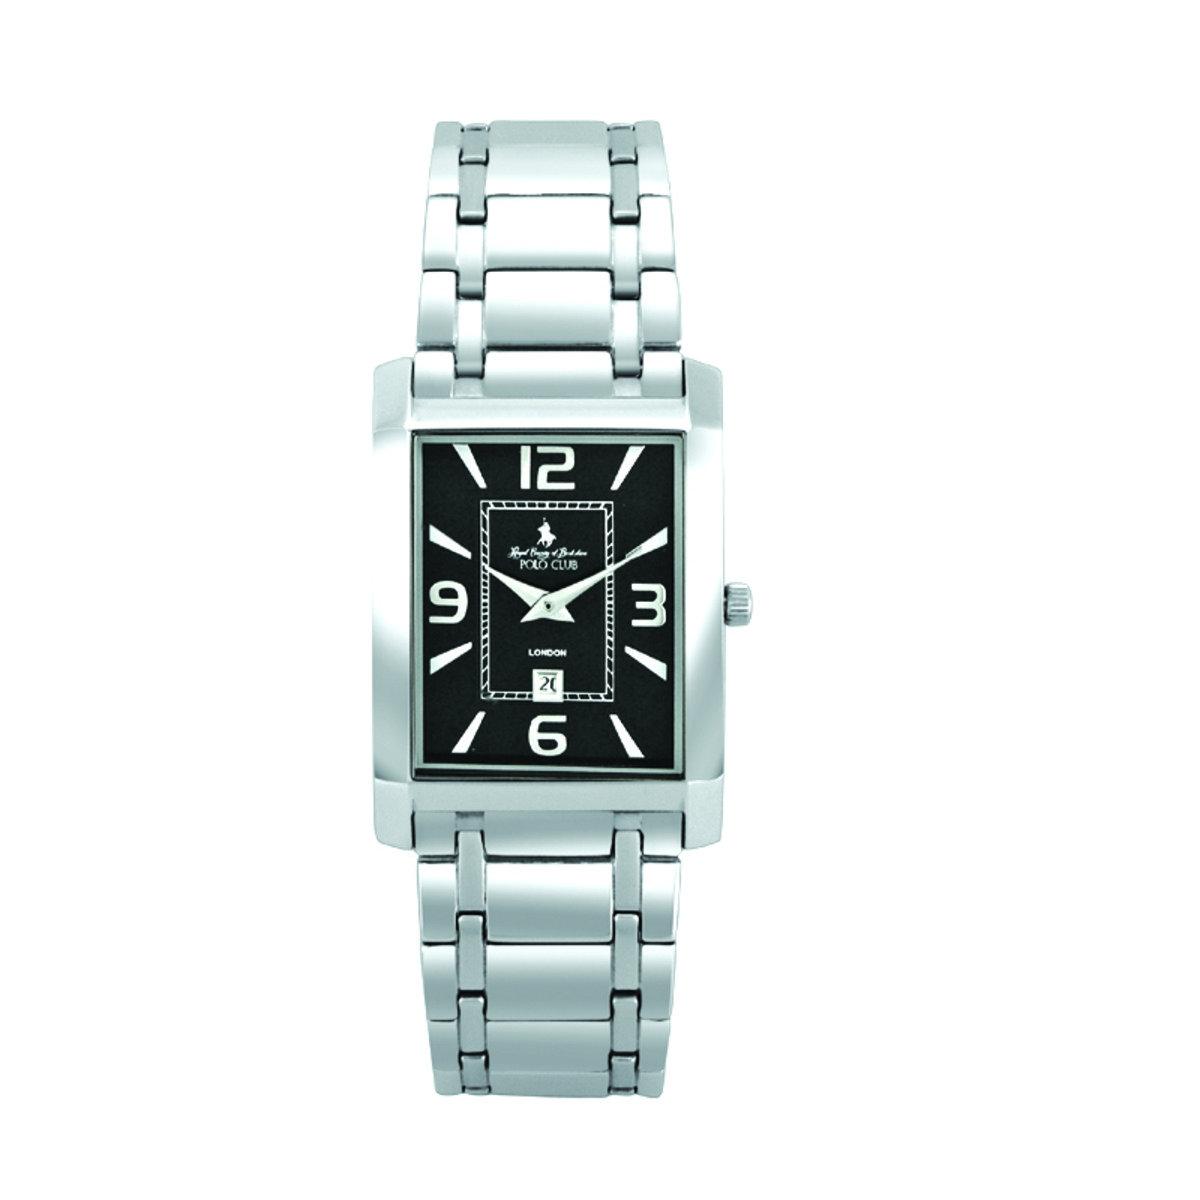 PL092-575BK-B Watch